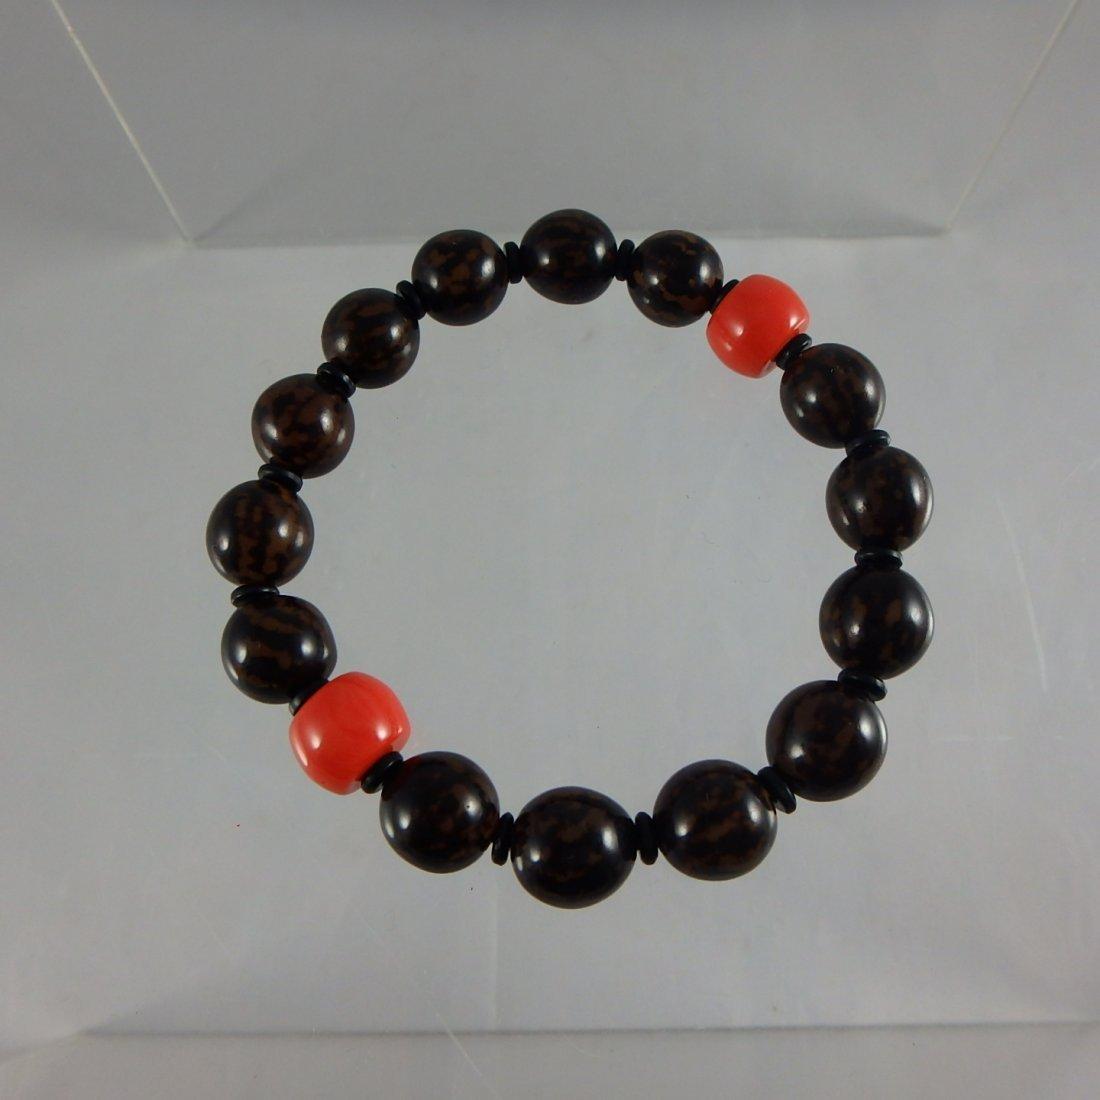 Chinese Qing Dynasty Bracelet